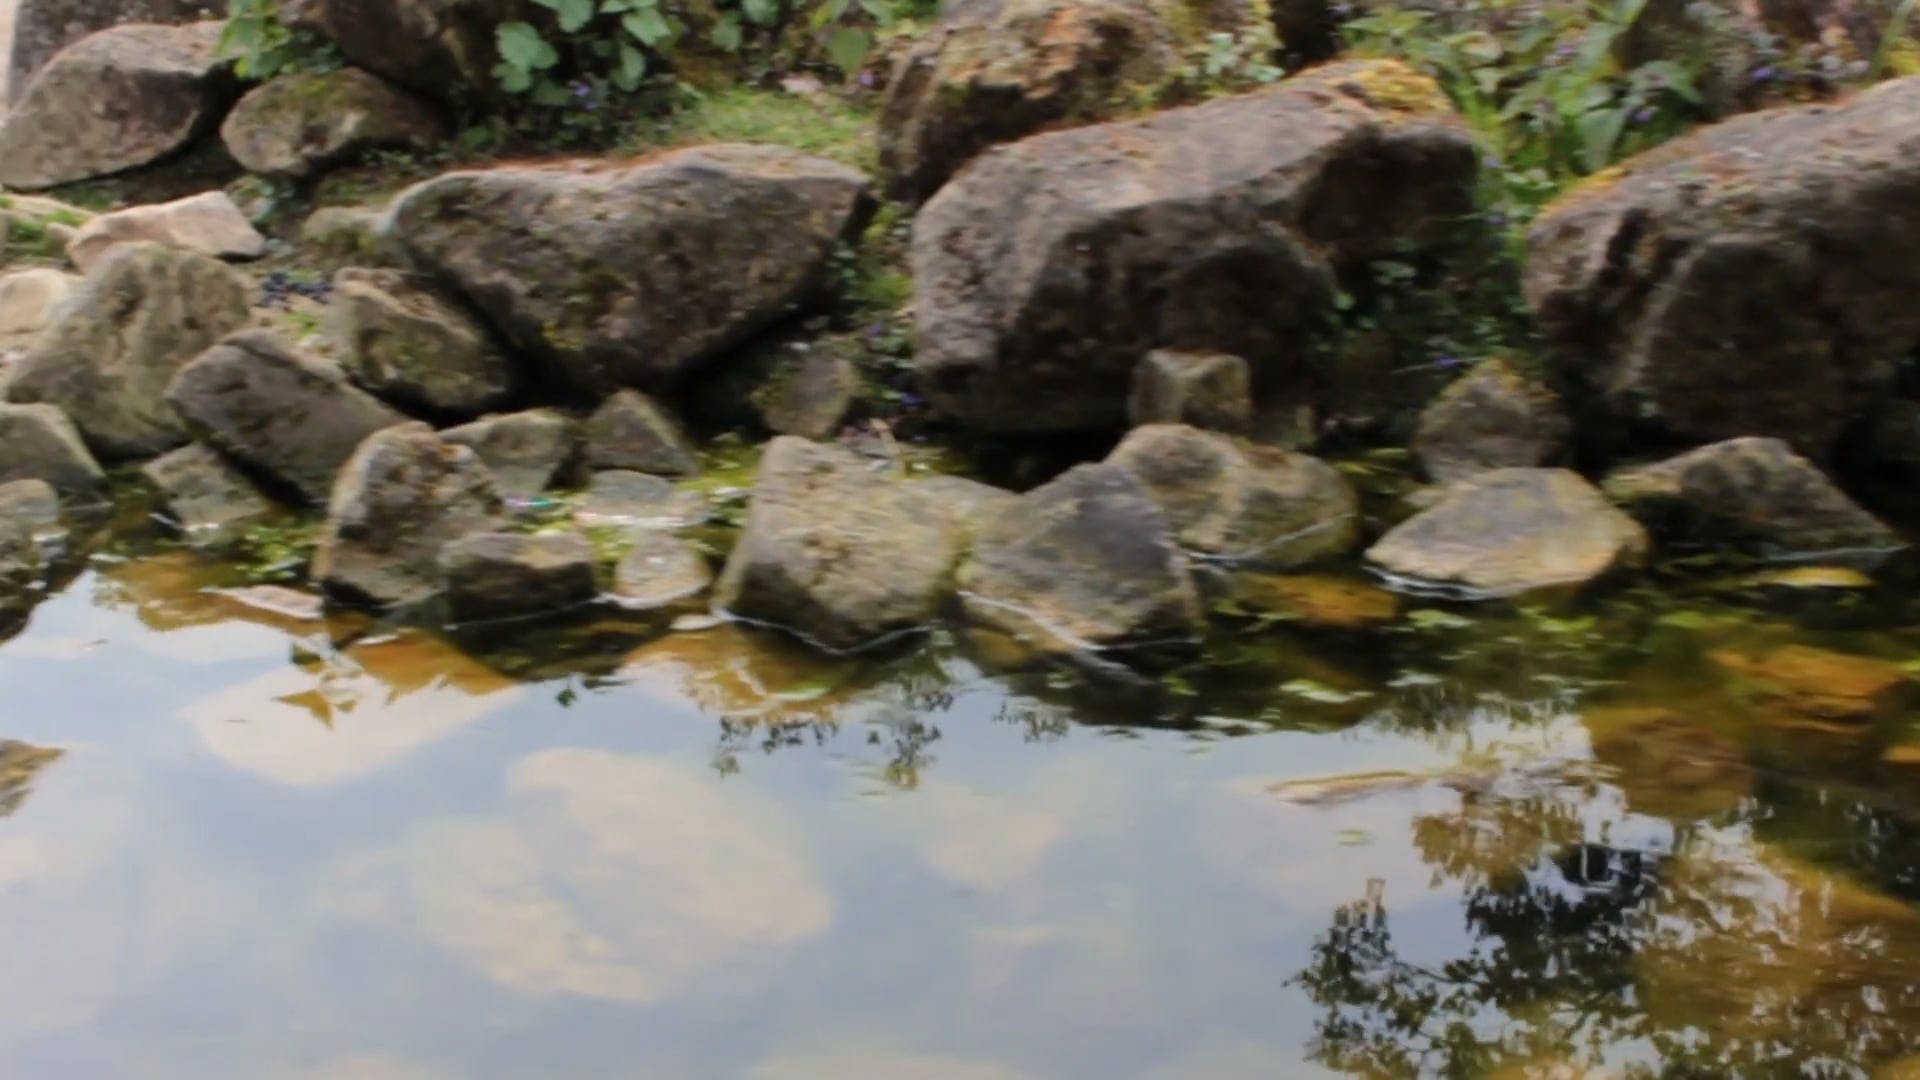 Big Rocks On Water